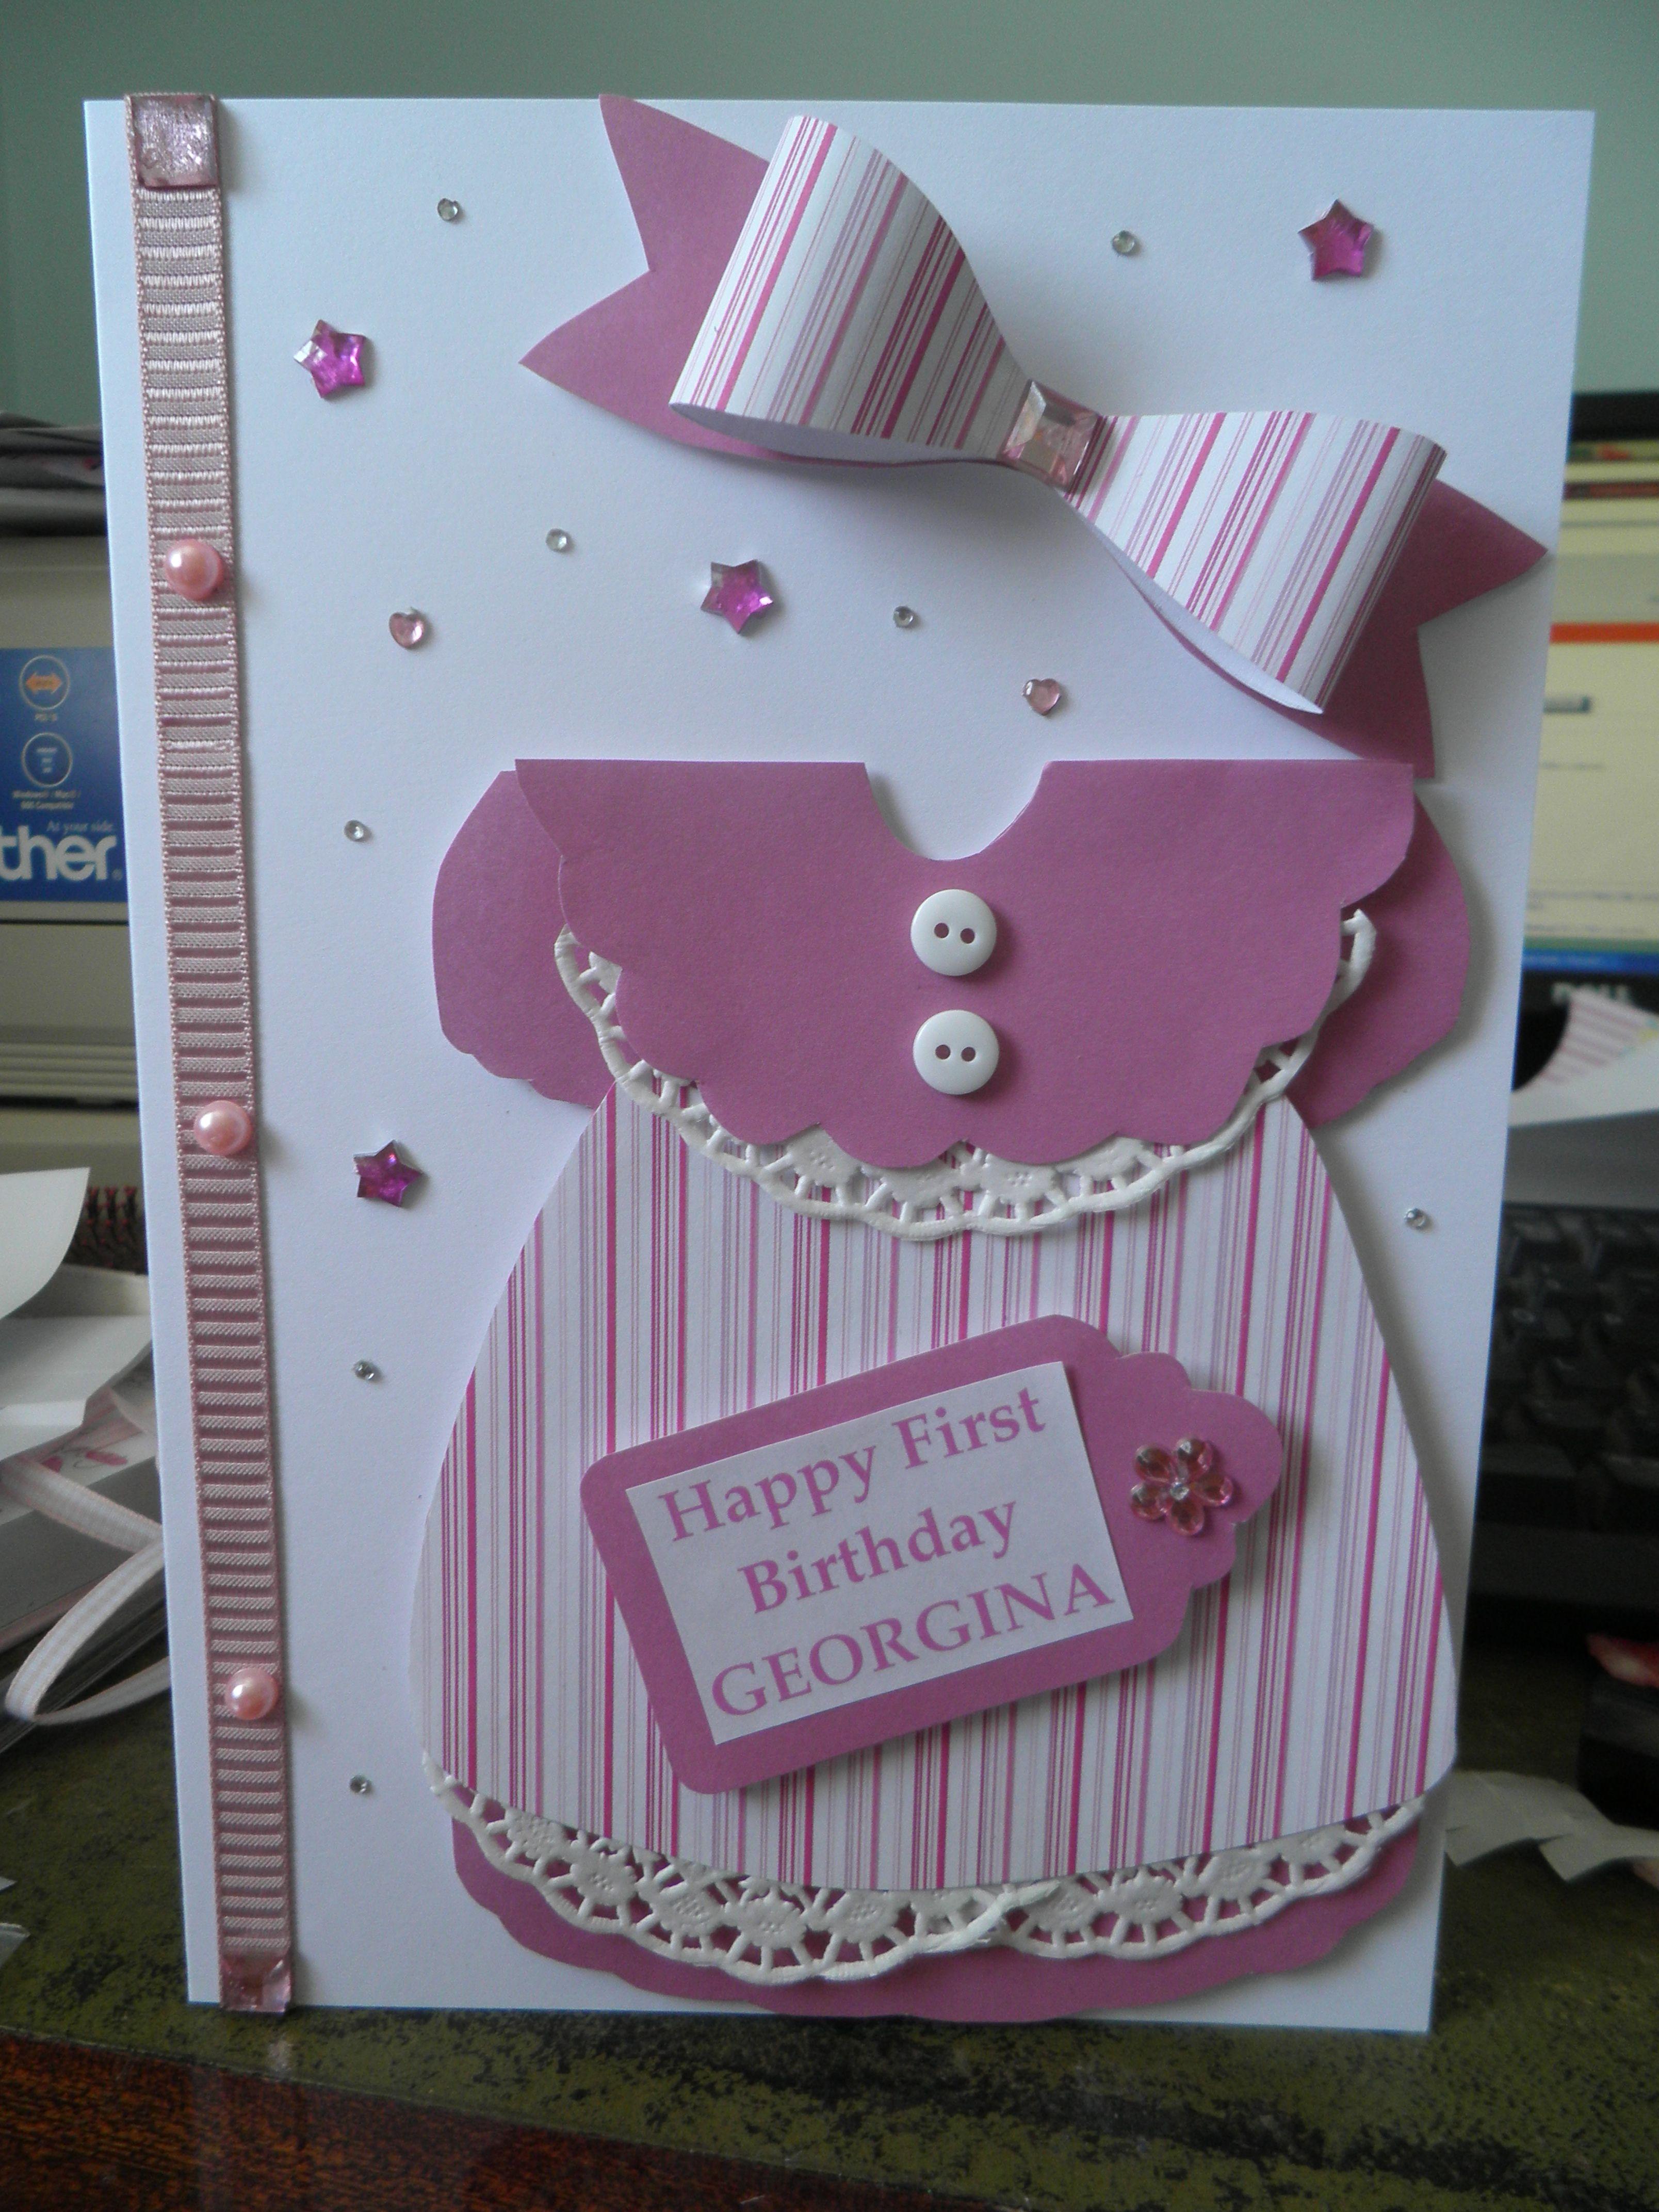 Baby girl 1st birthday dress card cards pinterest dress baby girl 1st birthday dress card kristyandbryce Gallery